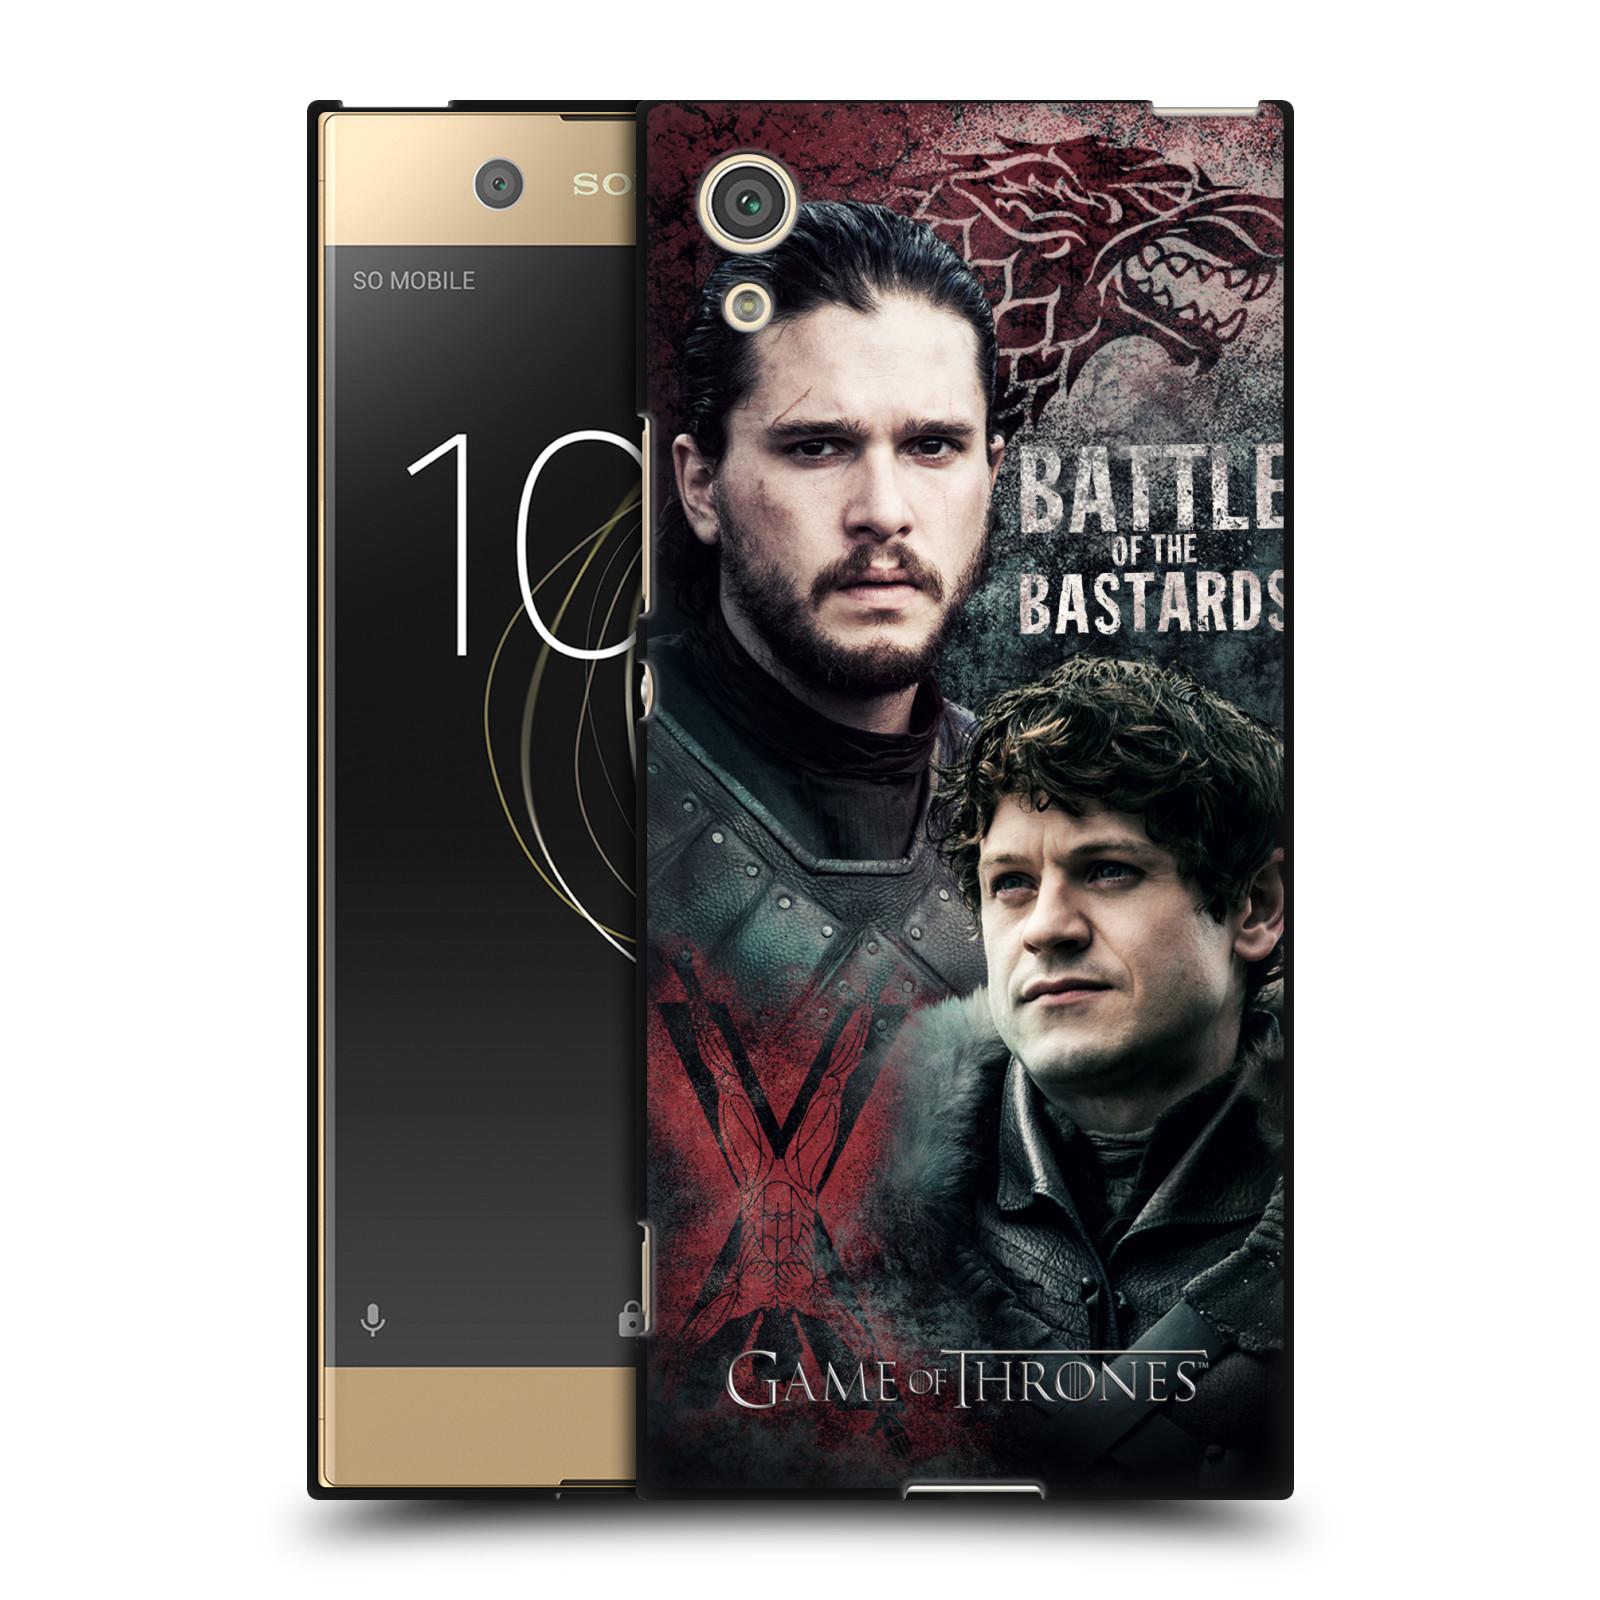 OFFICIAL-HBO-GAME-OF-THRONES-BATTLE-OF-BASTARDS-BLACK-GEL-CASE-FOR-SONY-PHONES